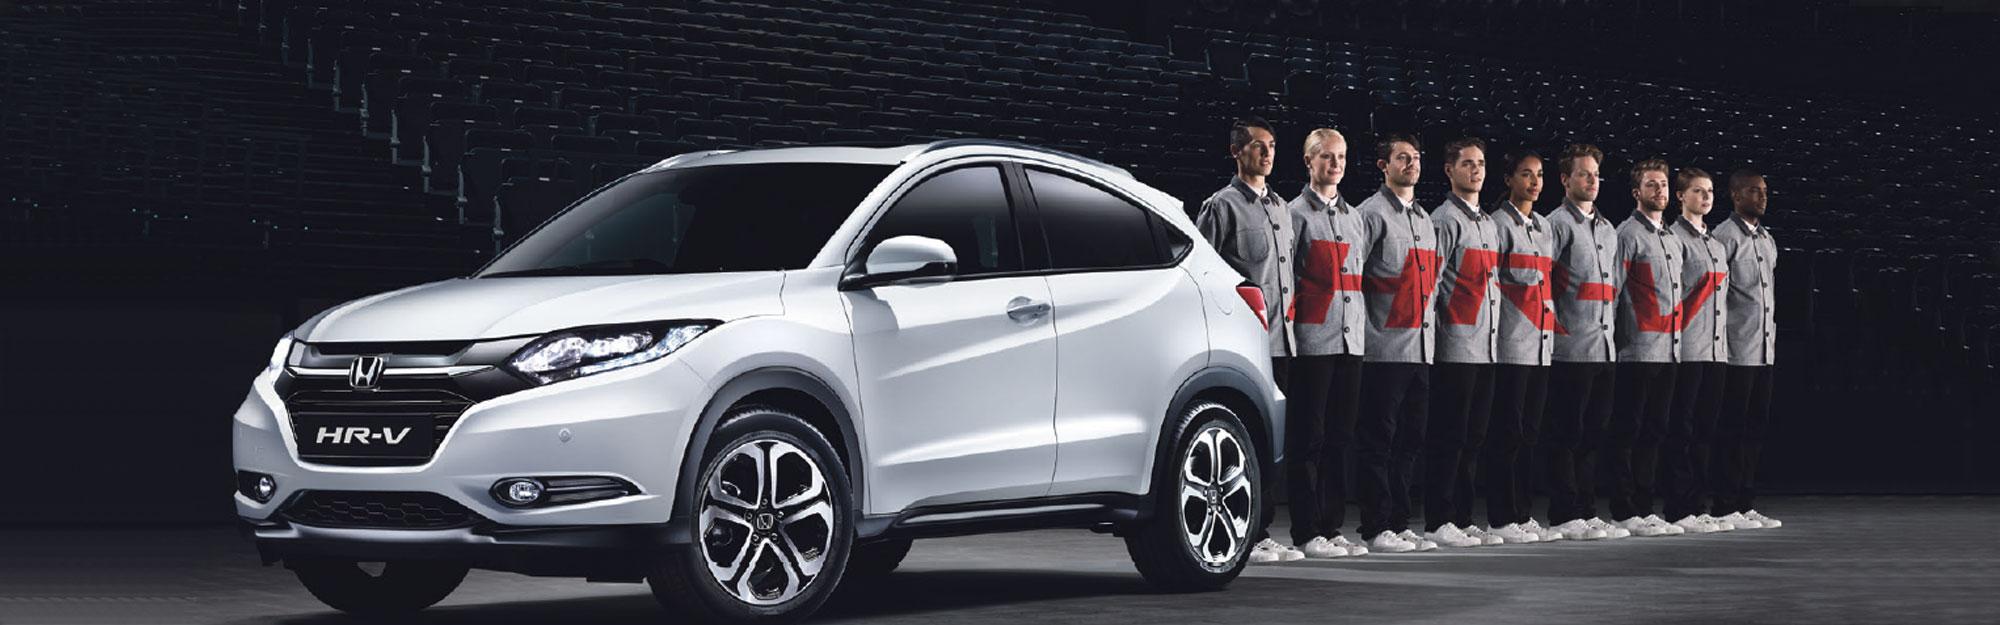 GARAGE-Vabis-Honda-HRV-2000x625